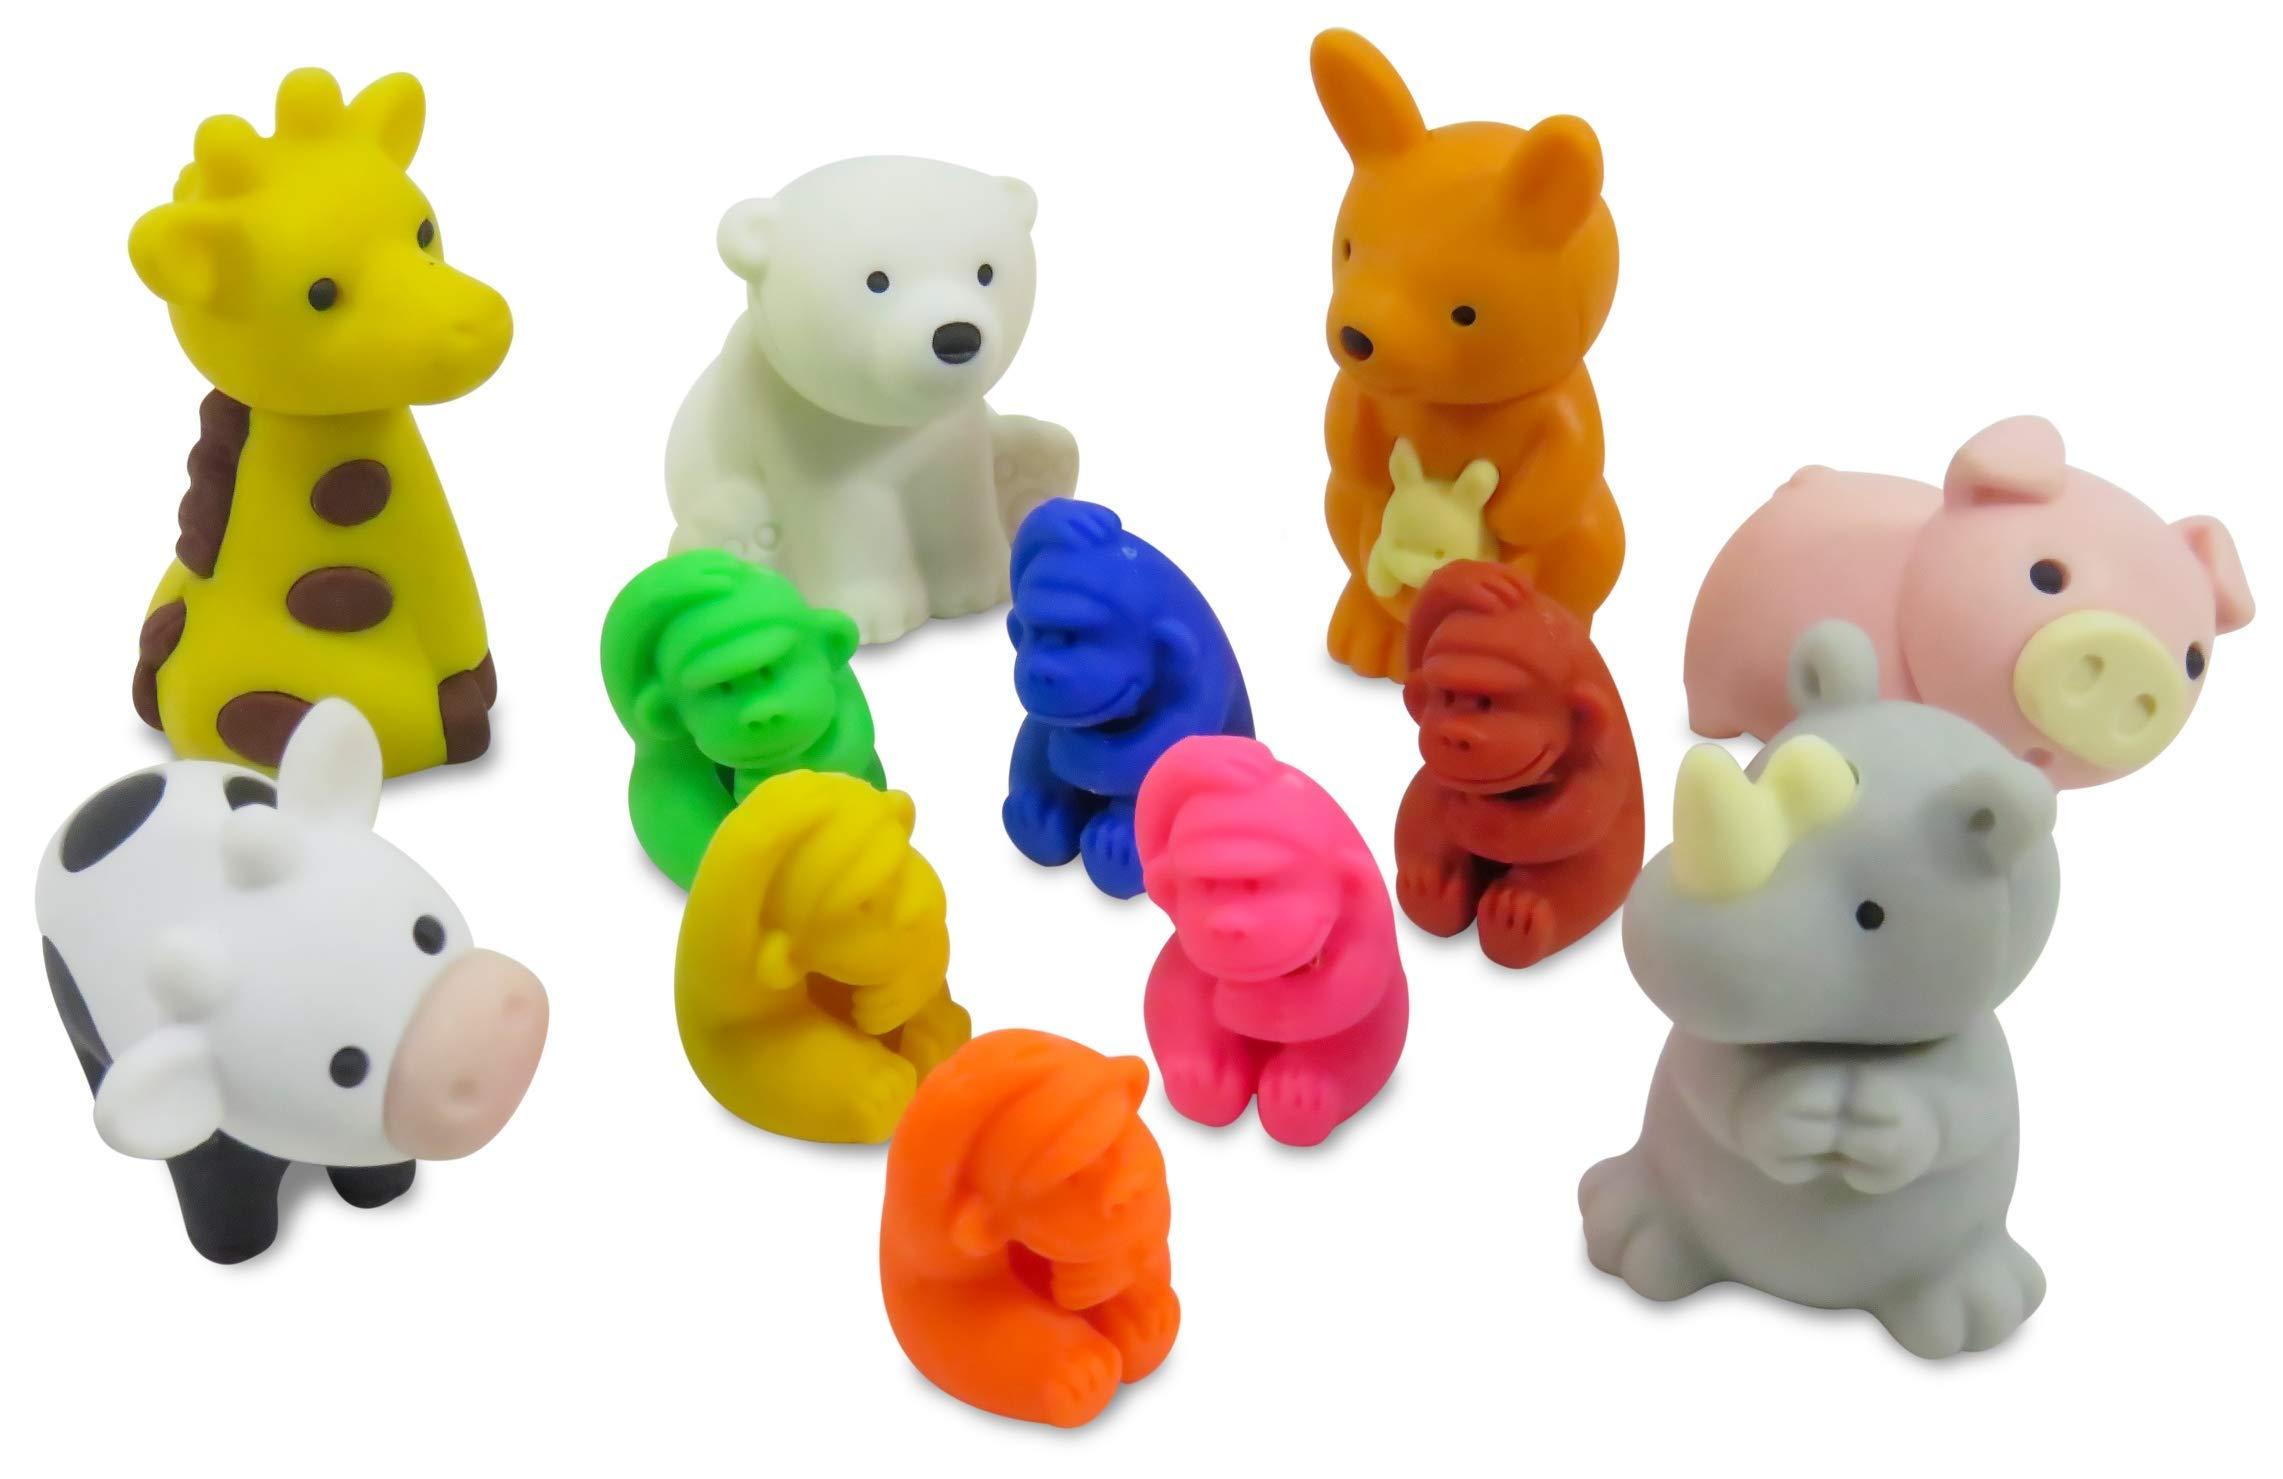 Take Apart Complete Your Collection Mini Erasers Gorilla Giraffe Polar Bear Rhino Kangaroo Pig Cow (Pack of 12) by Daiso Japan (Image #1)